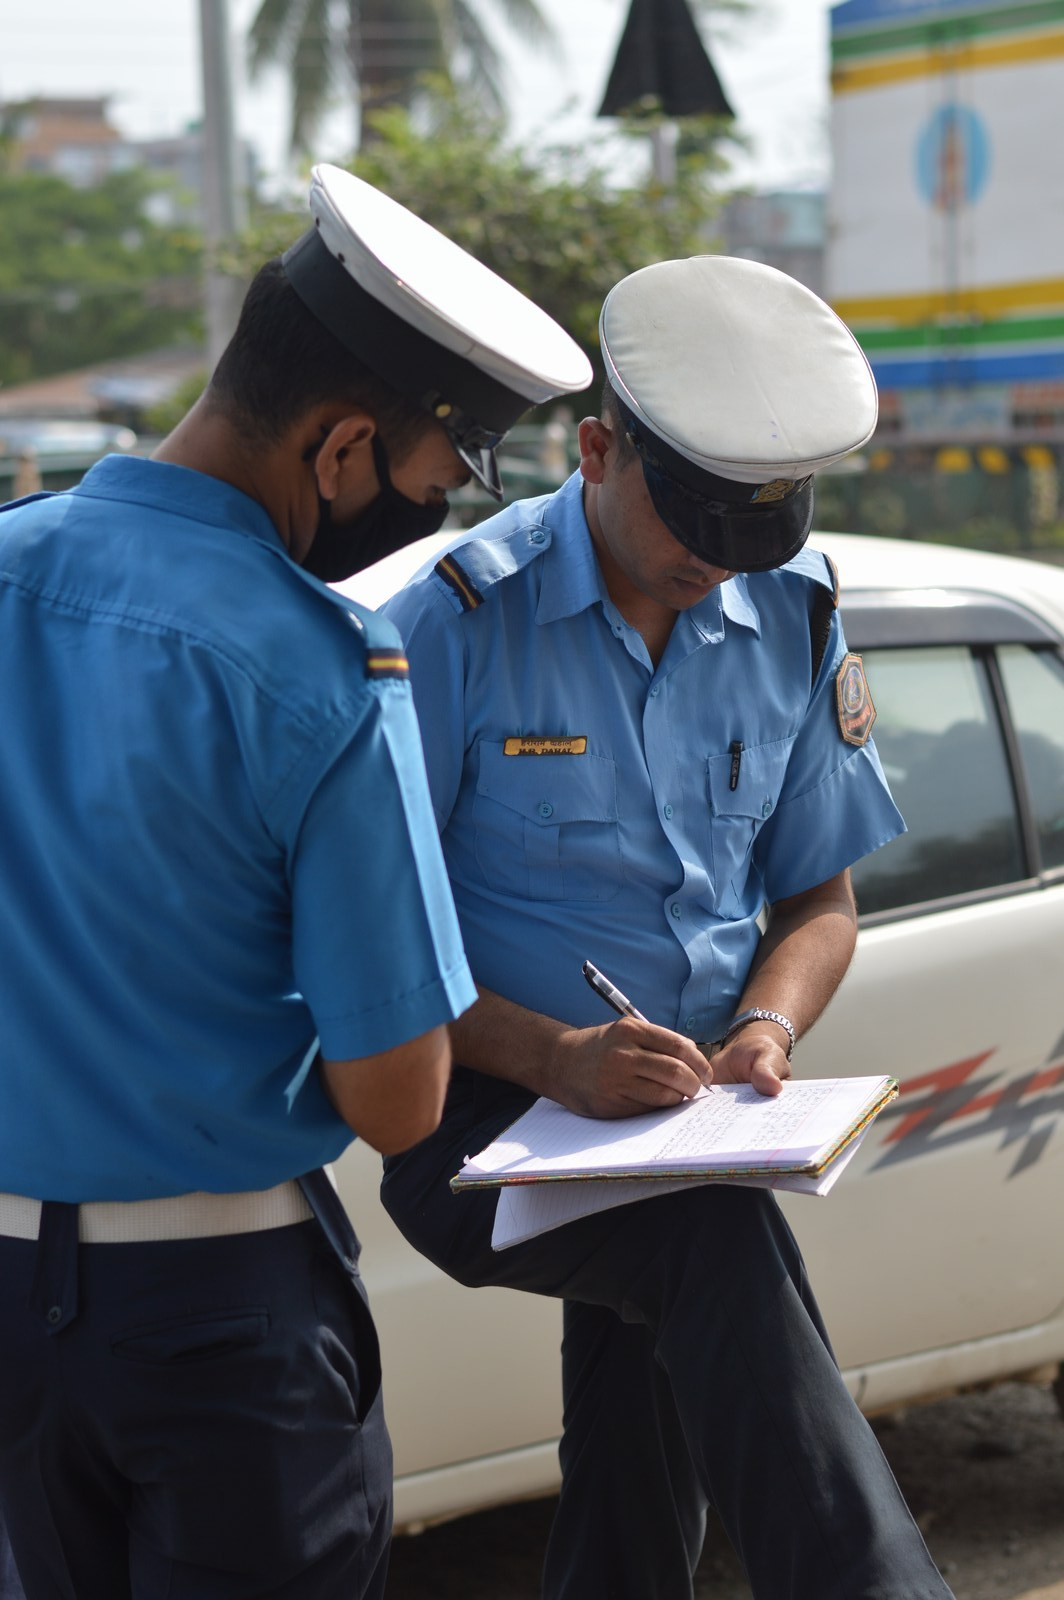 4th-UN-Global-Road-Safety-Week-2017-Traffic-Awareness-Program-Rotary-club-of-Kakarvitta-5